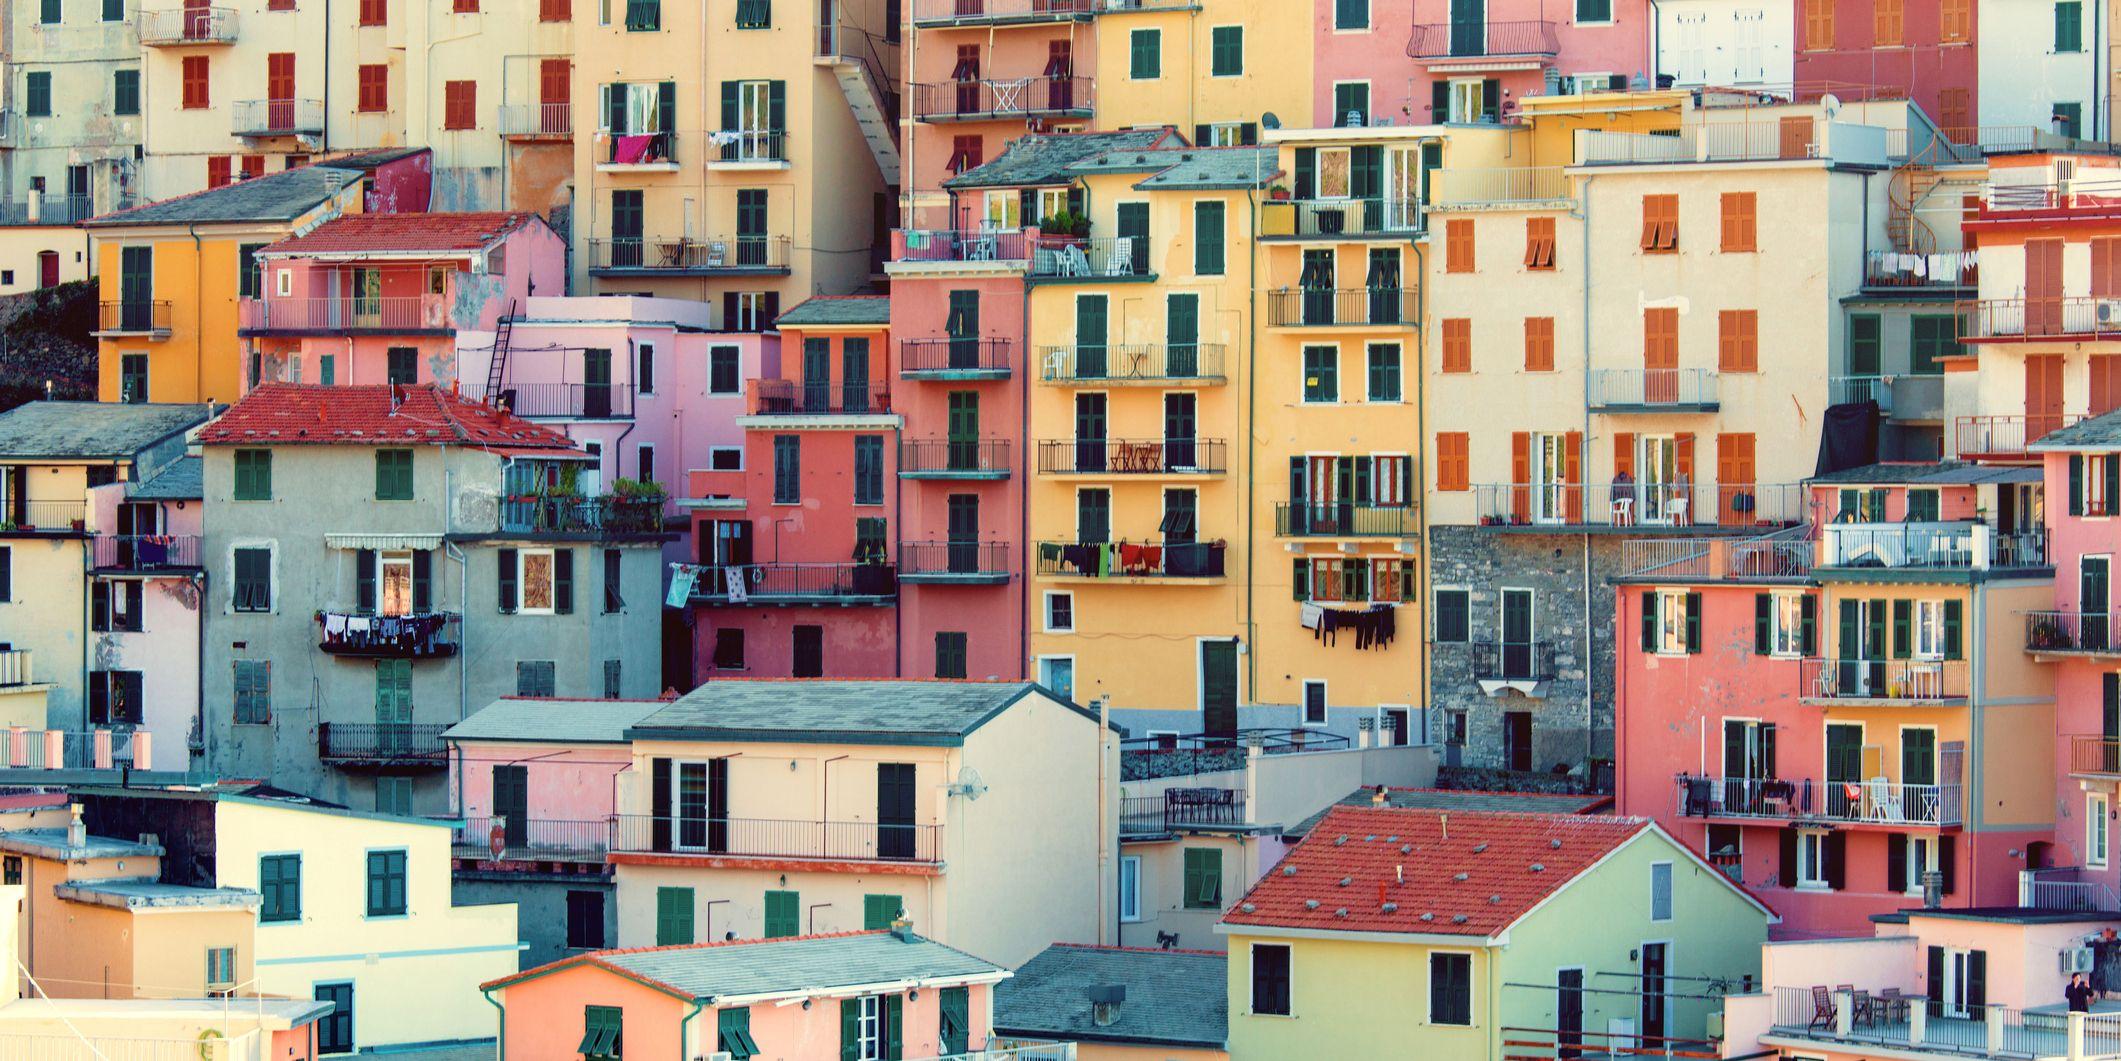 Italy, Liguria, Cinque Terre, La Spezia district, Manarola, Colorful houses